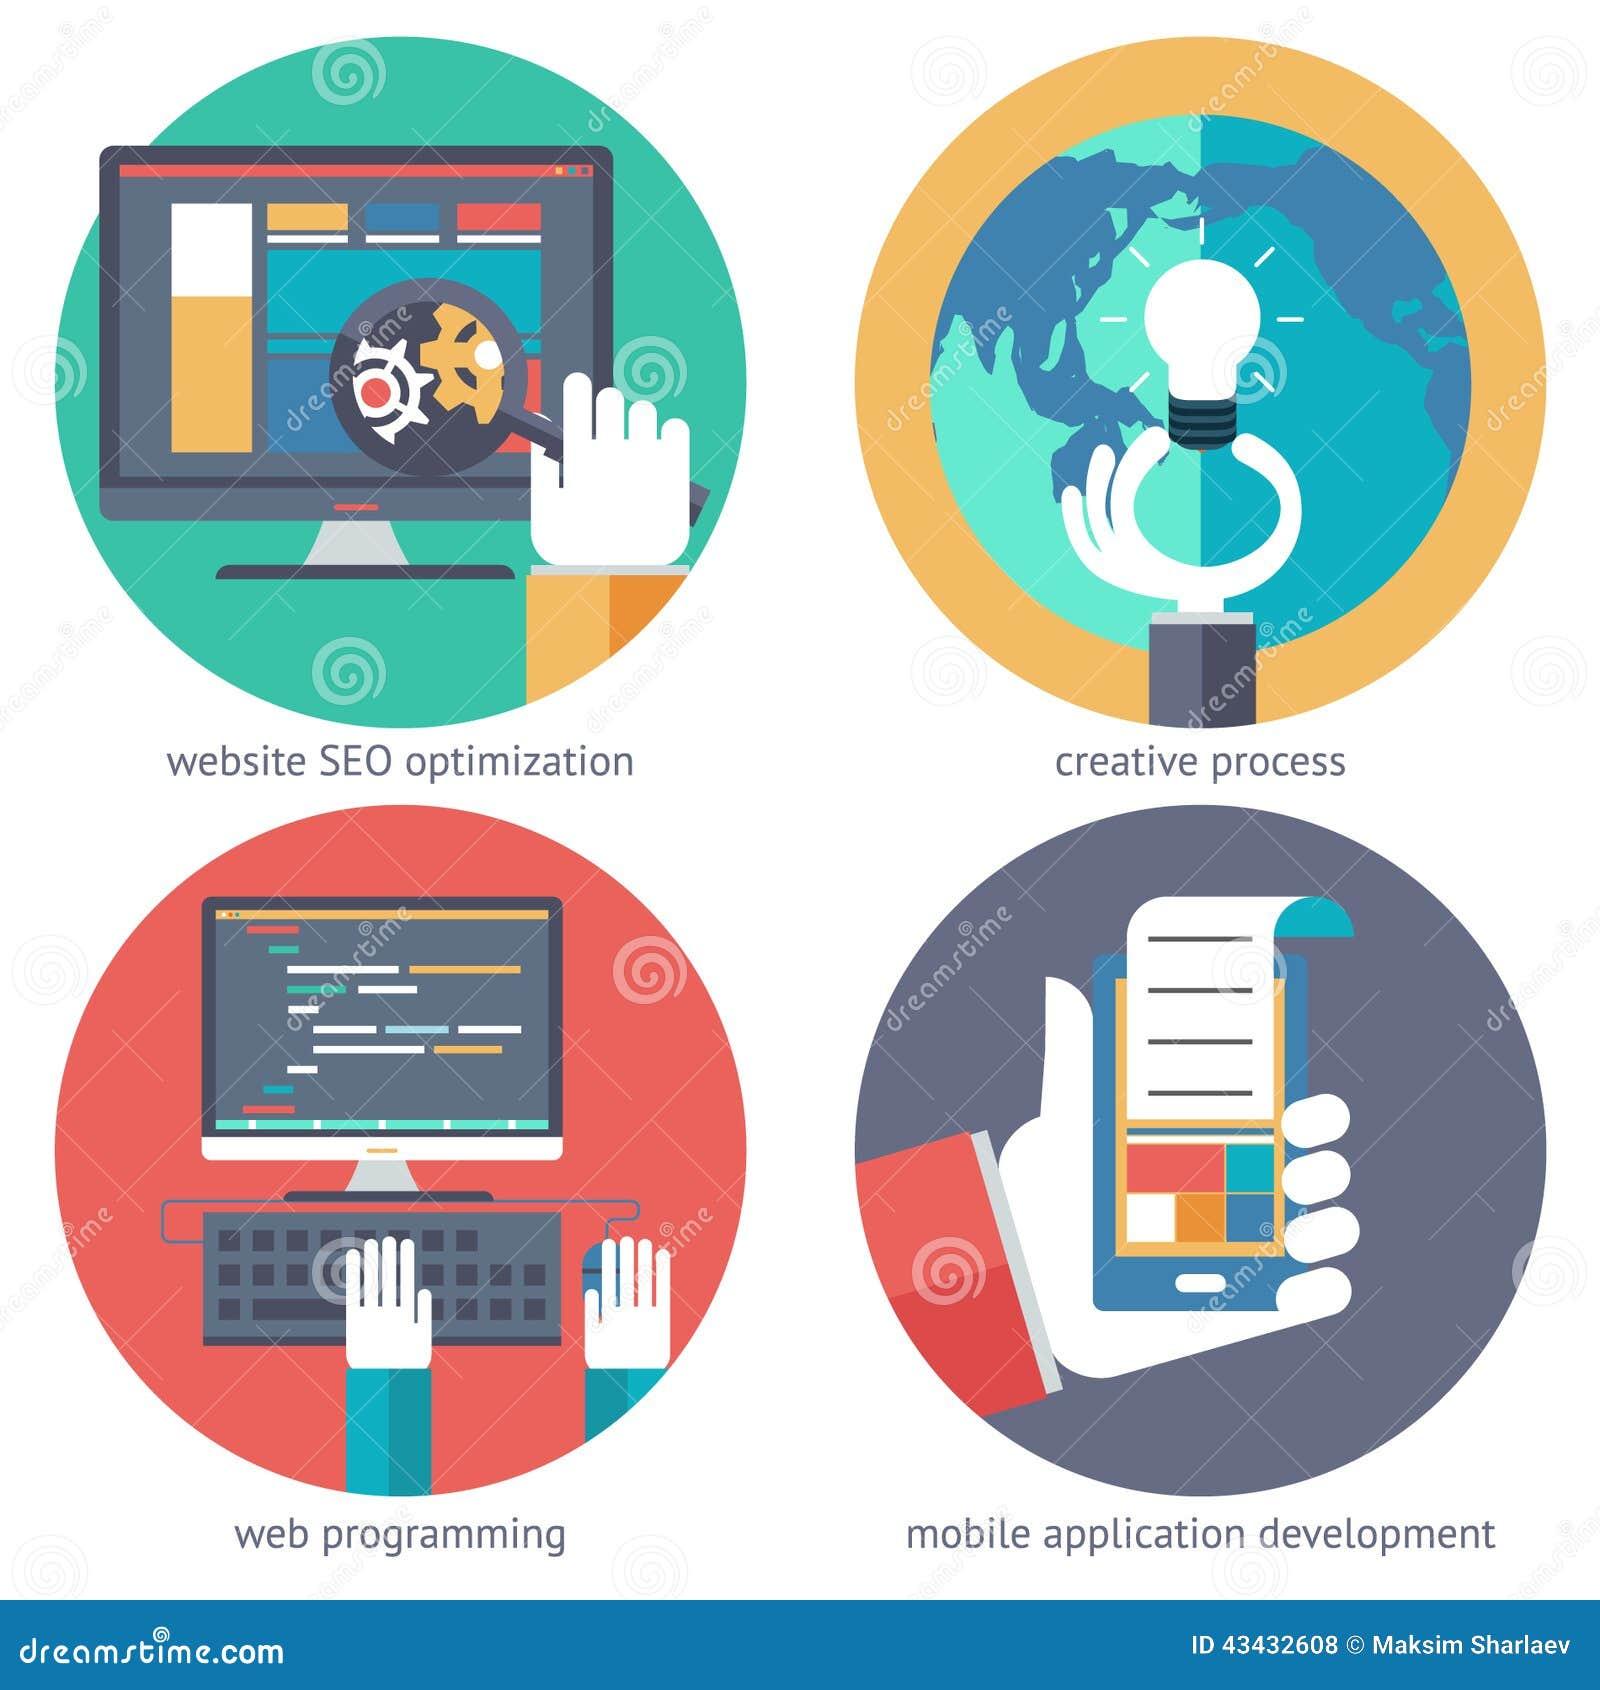 creative ideas web programming design mobile apps seo